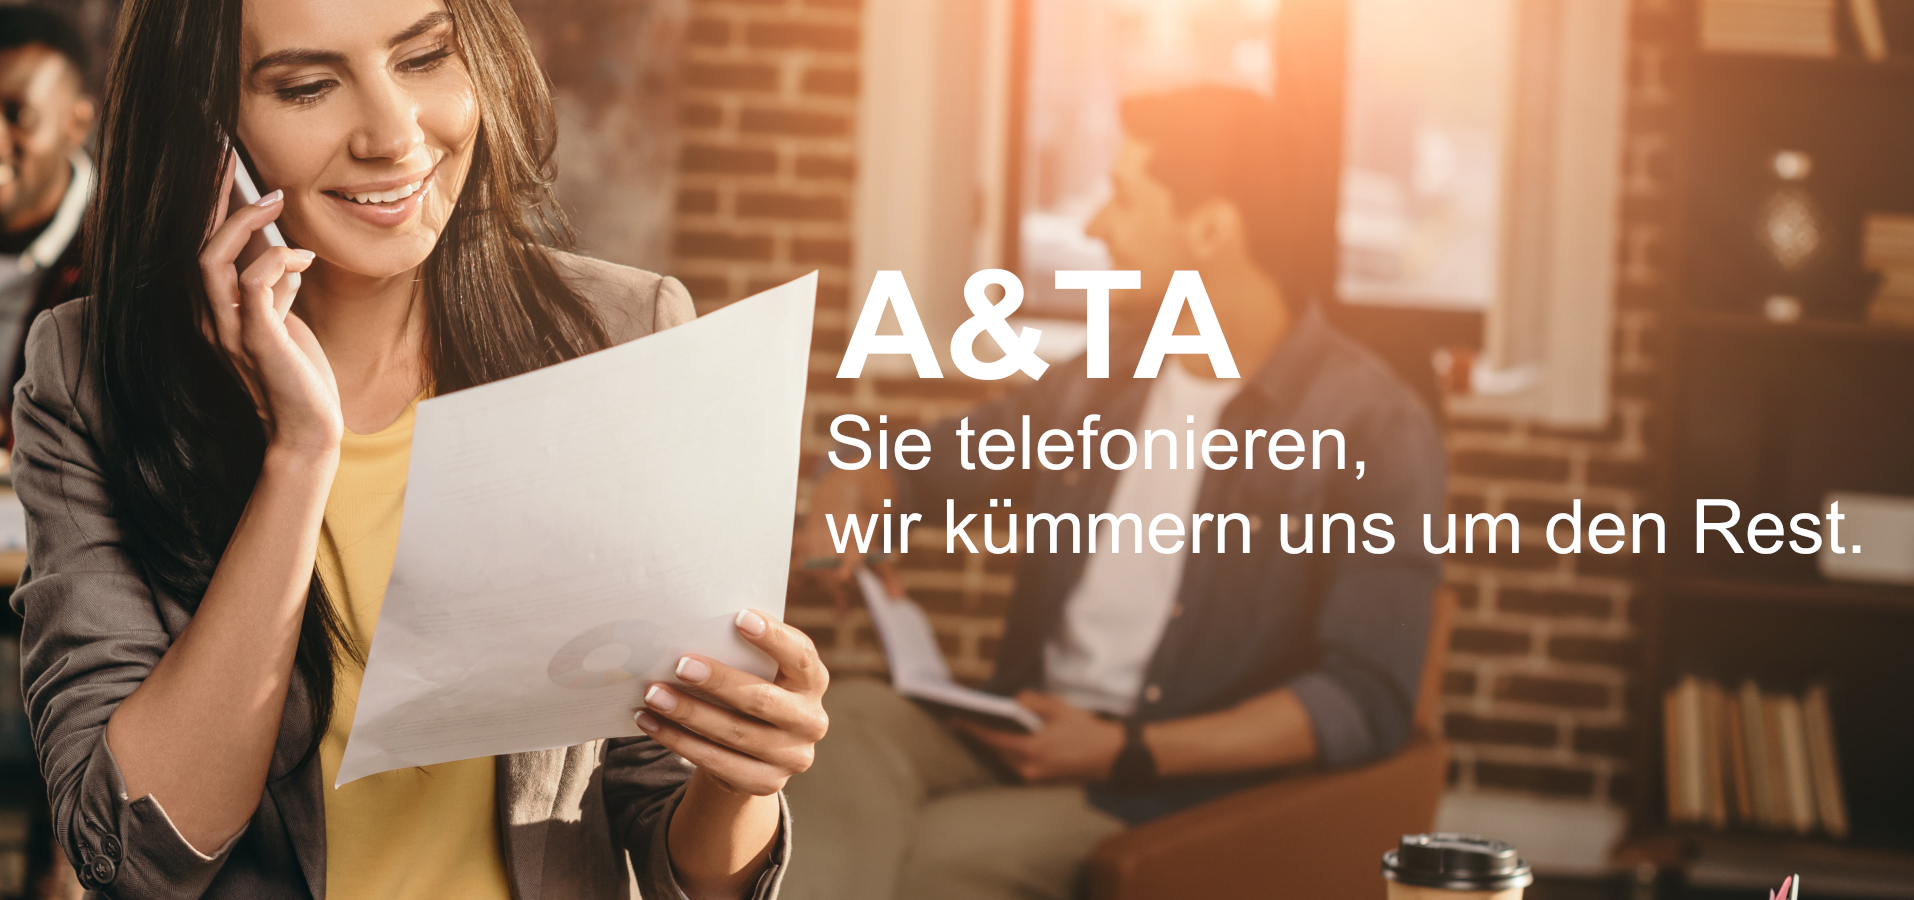 A&TA Mobilfunkmanagement Berlin